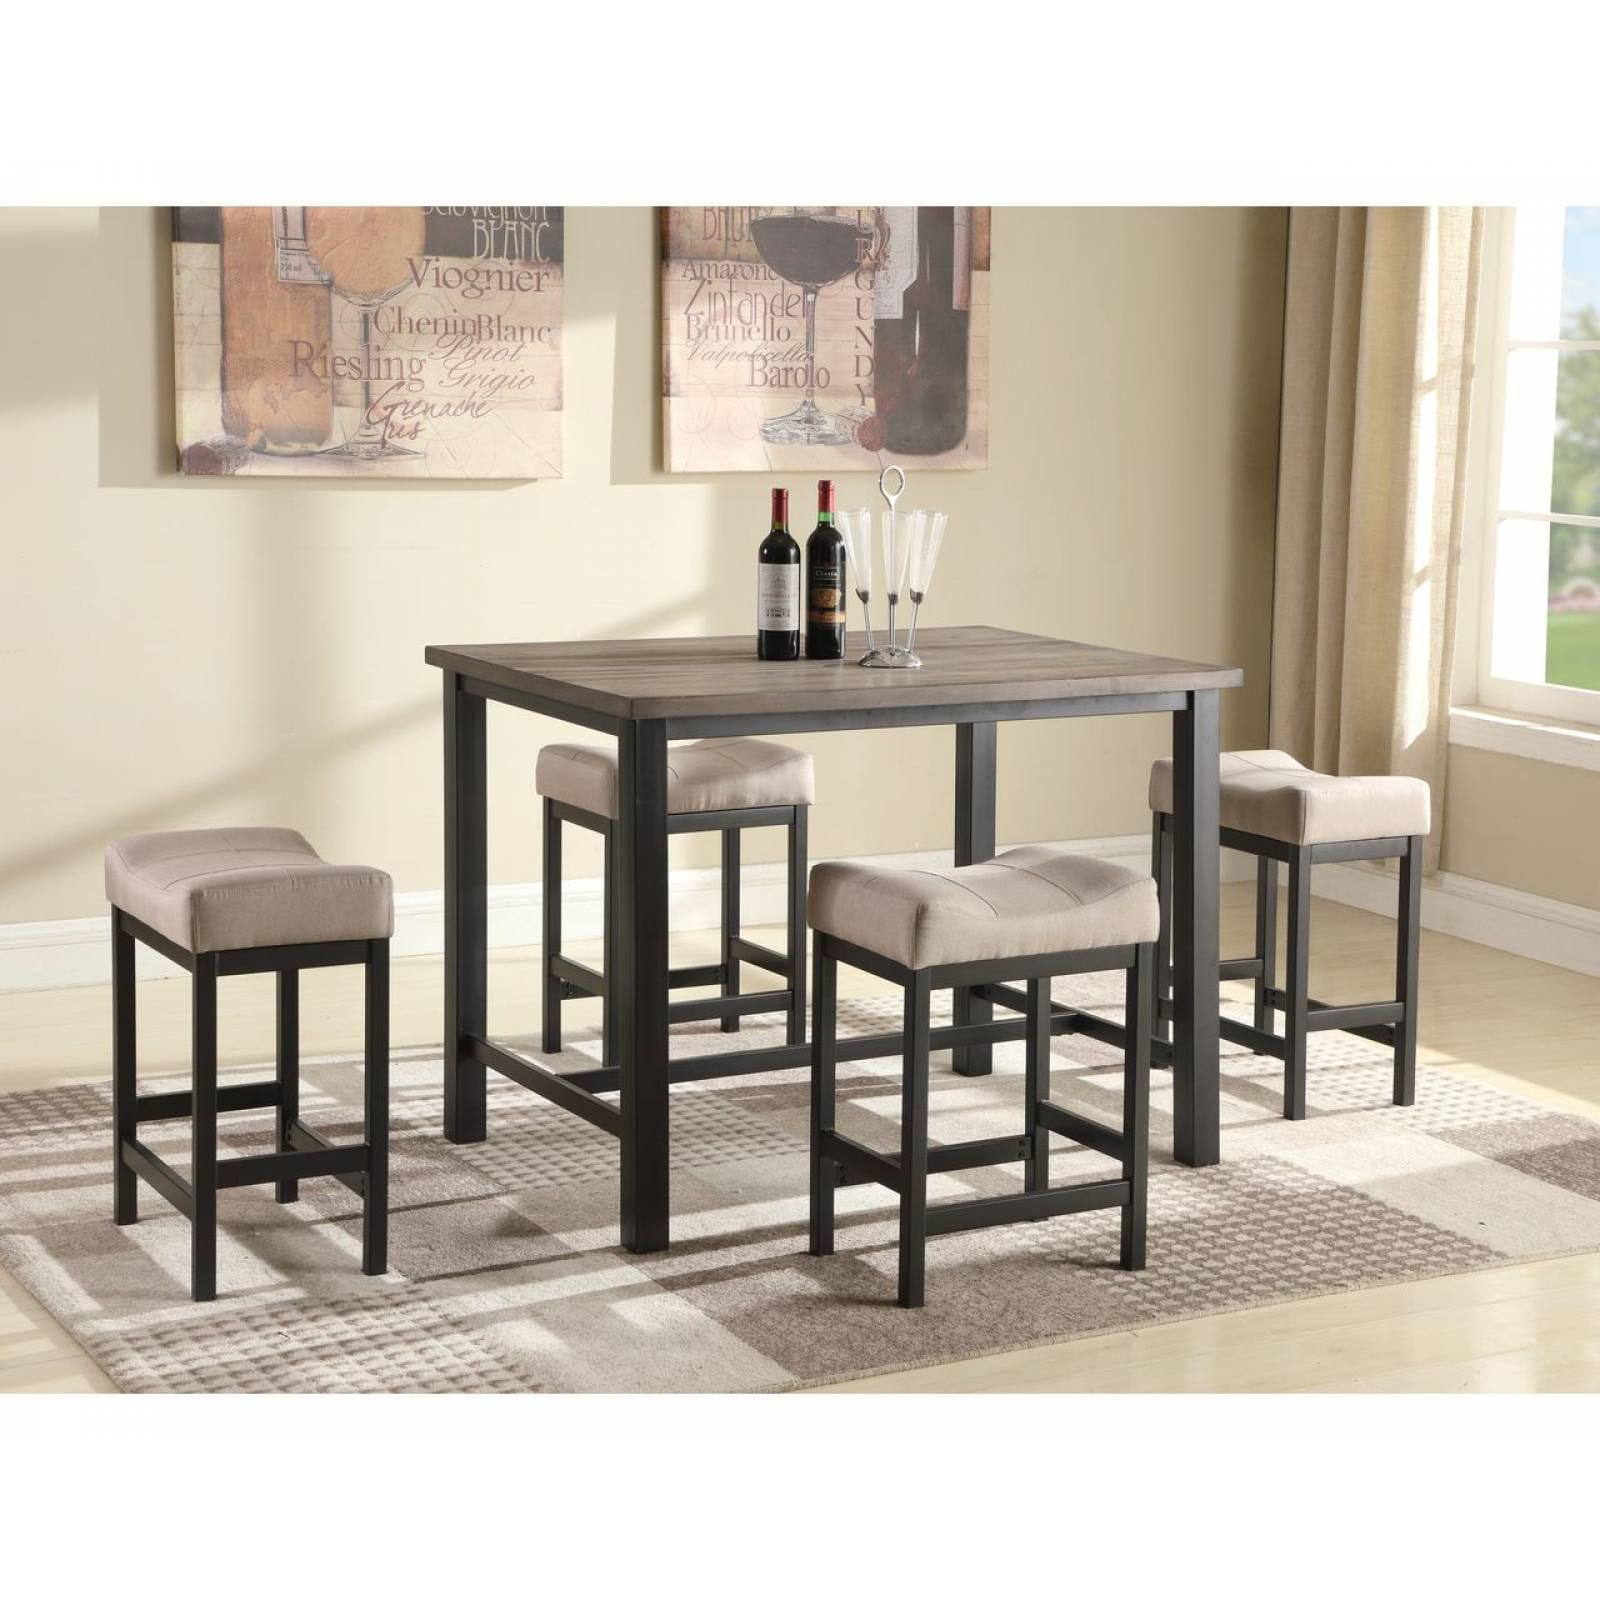 Mesa con 4 sillas para comedor Bran 1861 color café